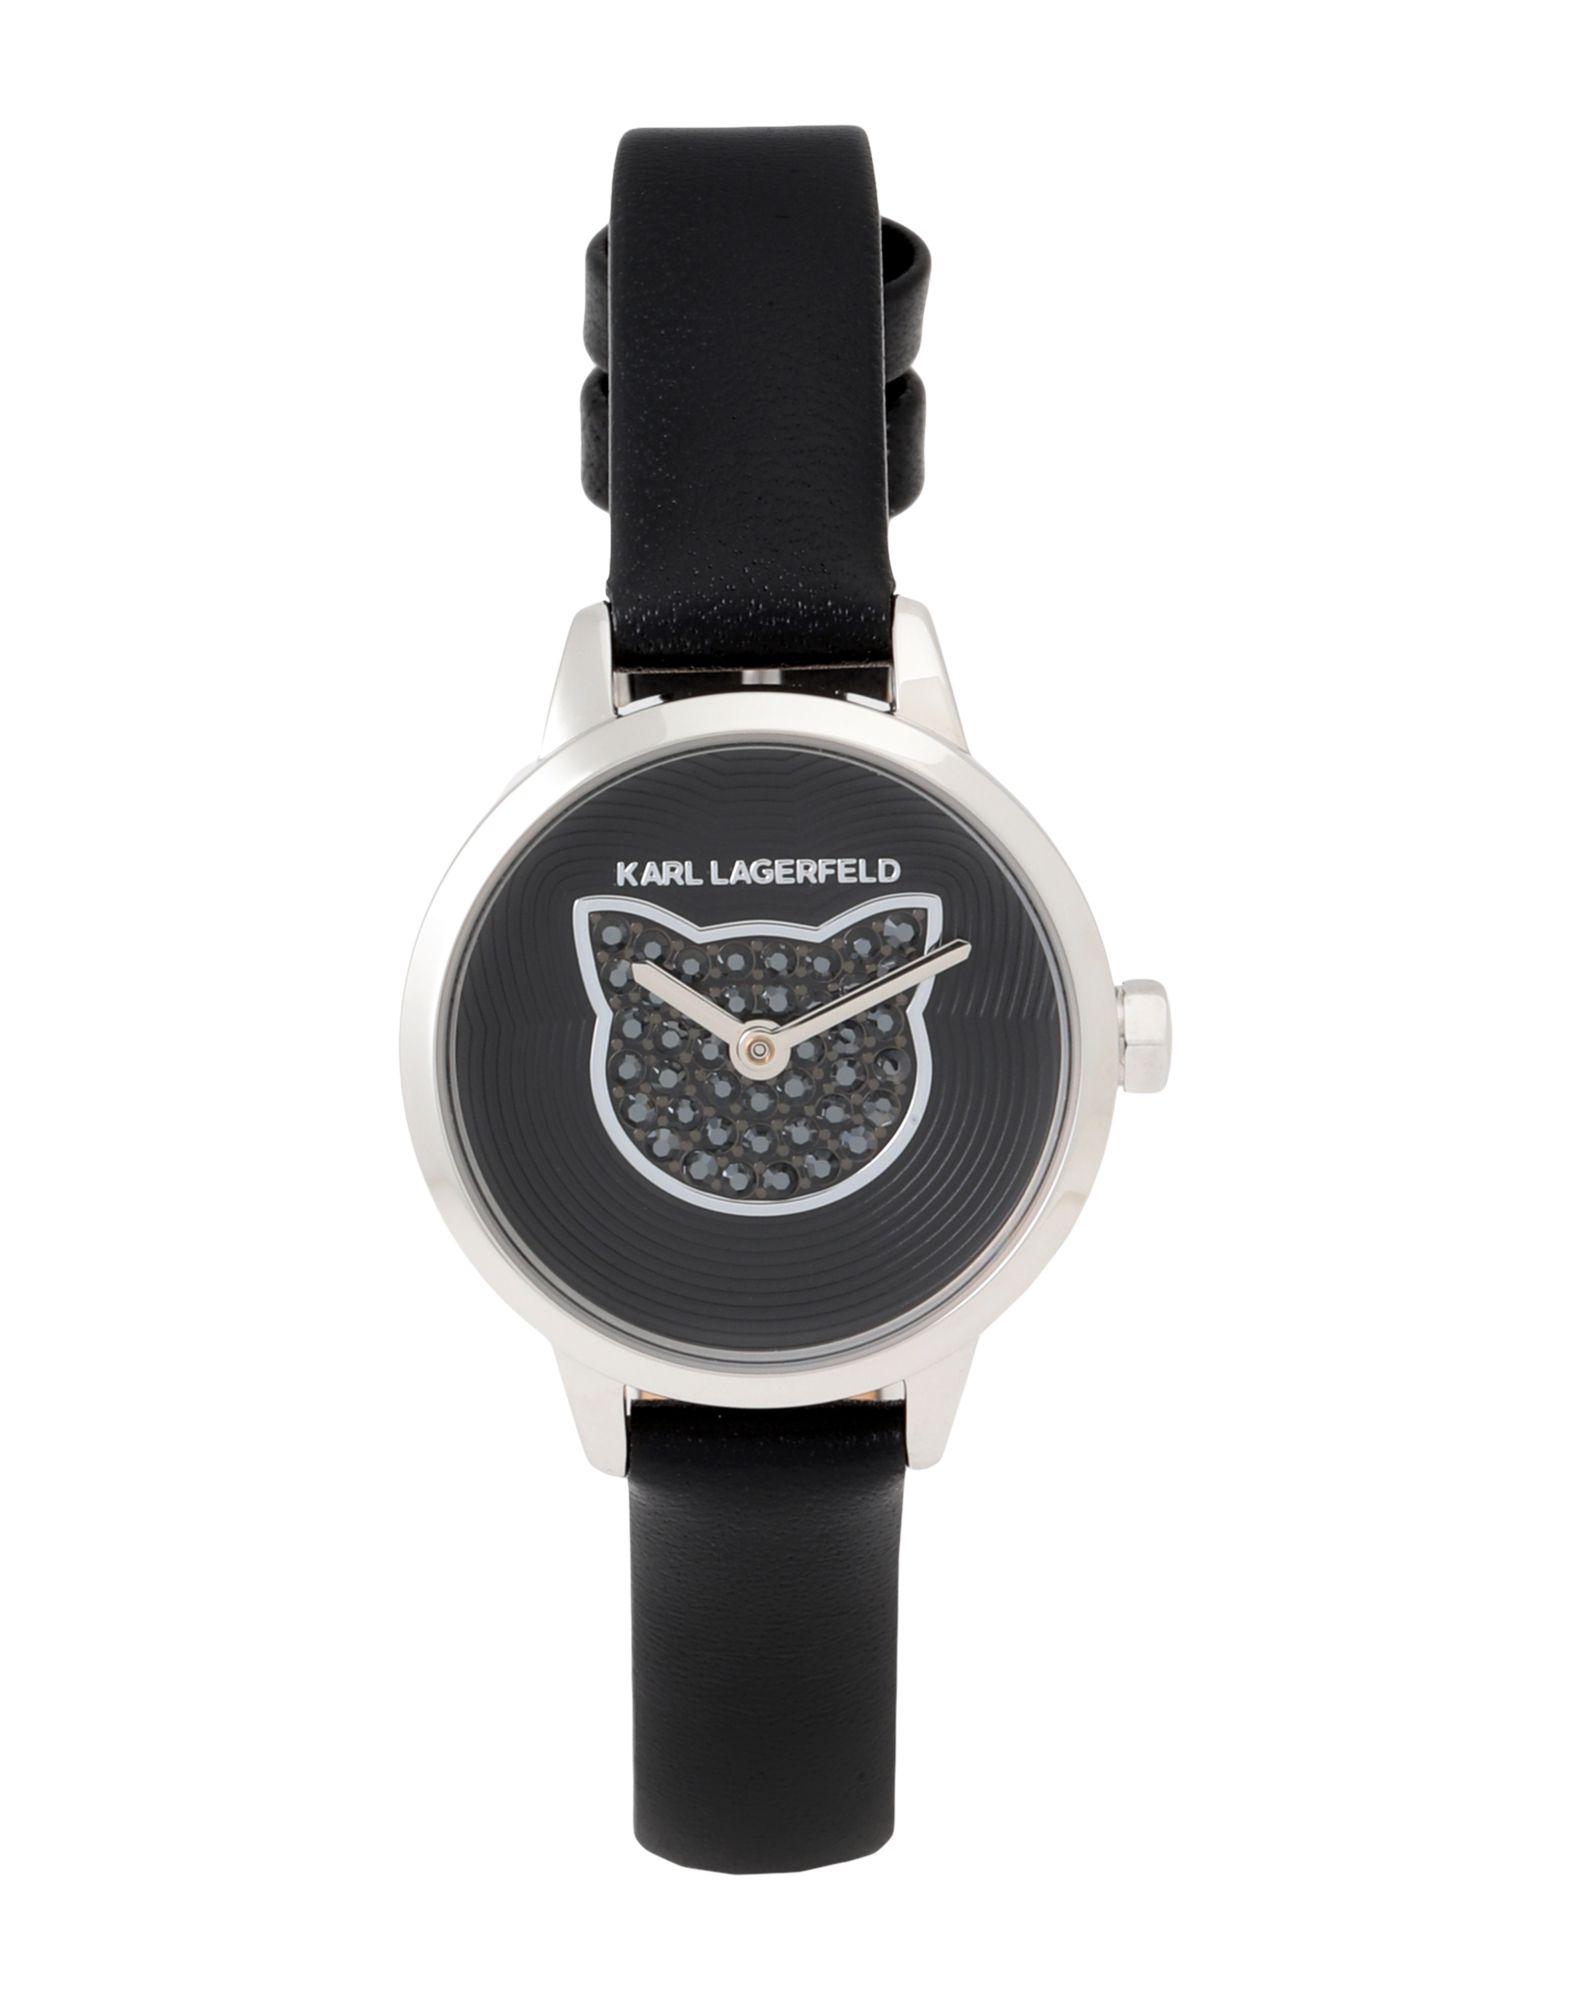 KARL LAGERFELD Wrist watches - Item 50242317